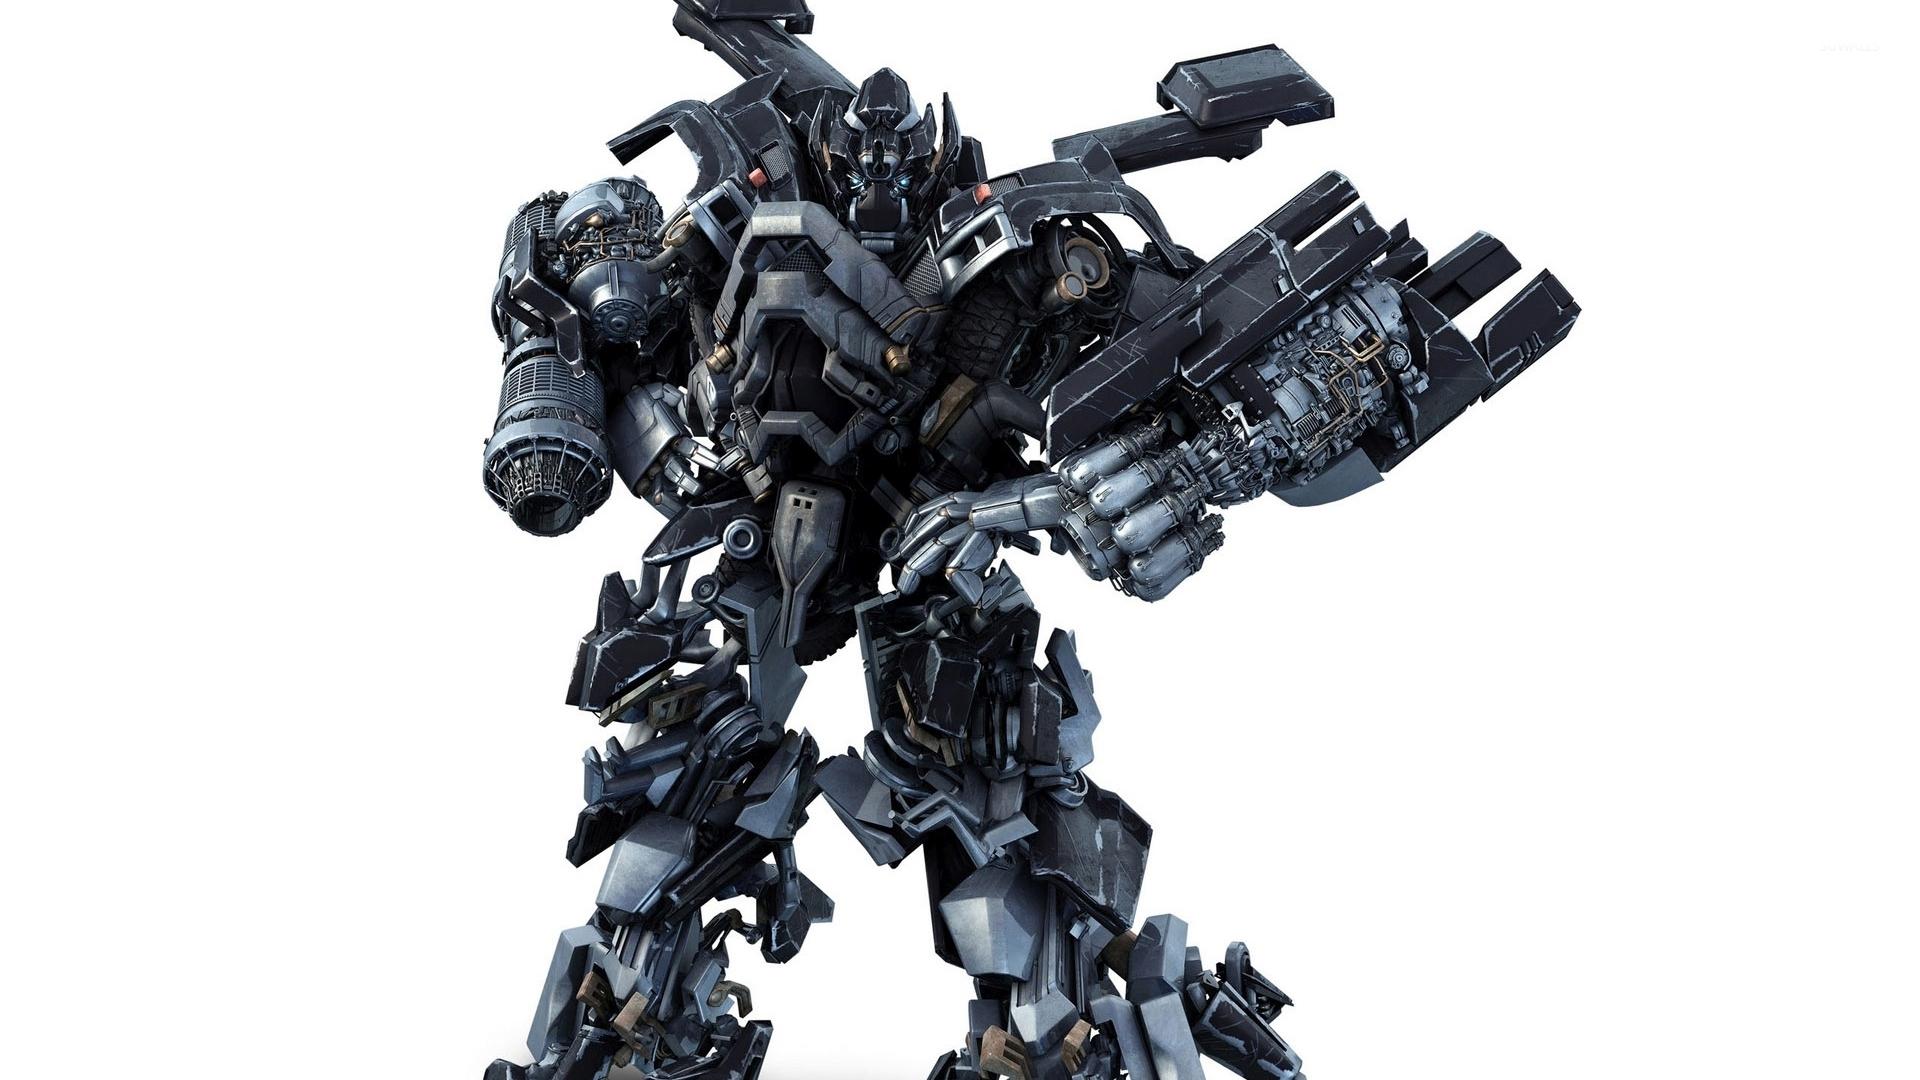 Transformers Fall Of Cybertron Wallpaper Ironhide Transformers 2 Wallpaper Movie Wallpapers